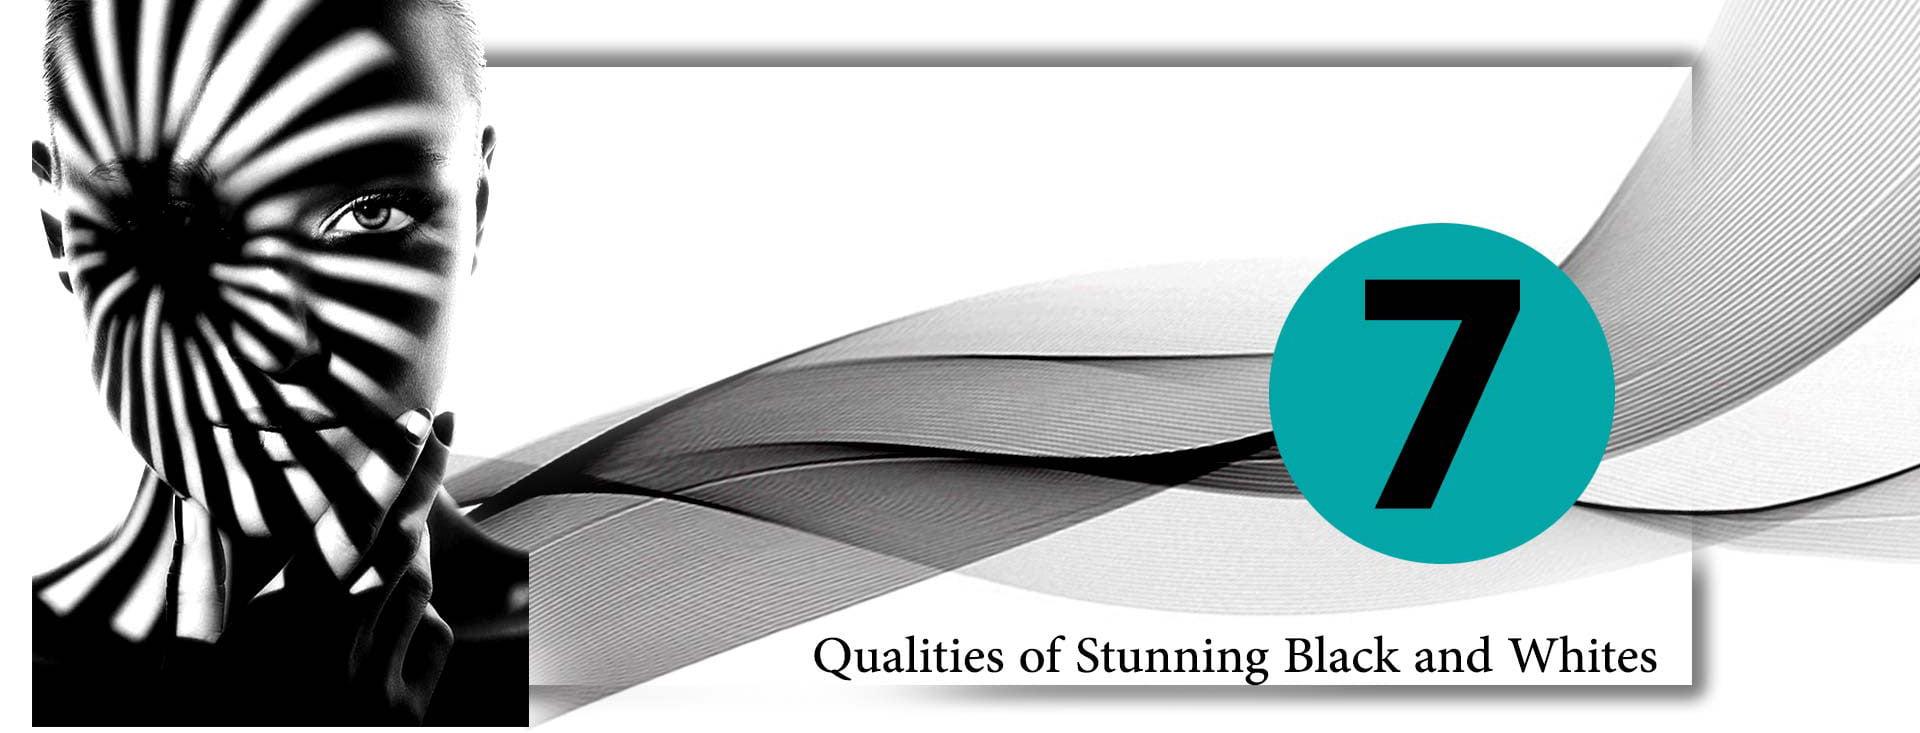 f Stunning Black and Whites 1 1 - ویژگی عکس های سیاه و سفید کدامند و چگونه میتوان به آنها دست یافت ؟